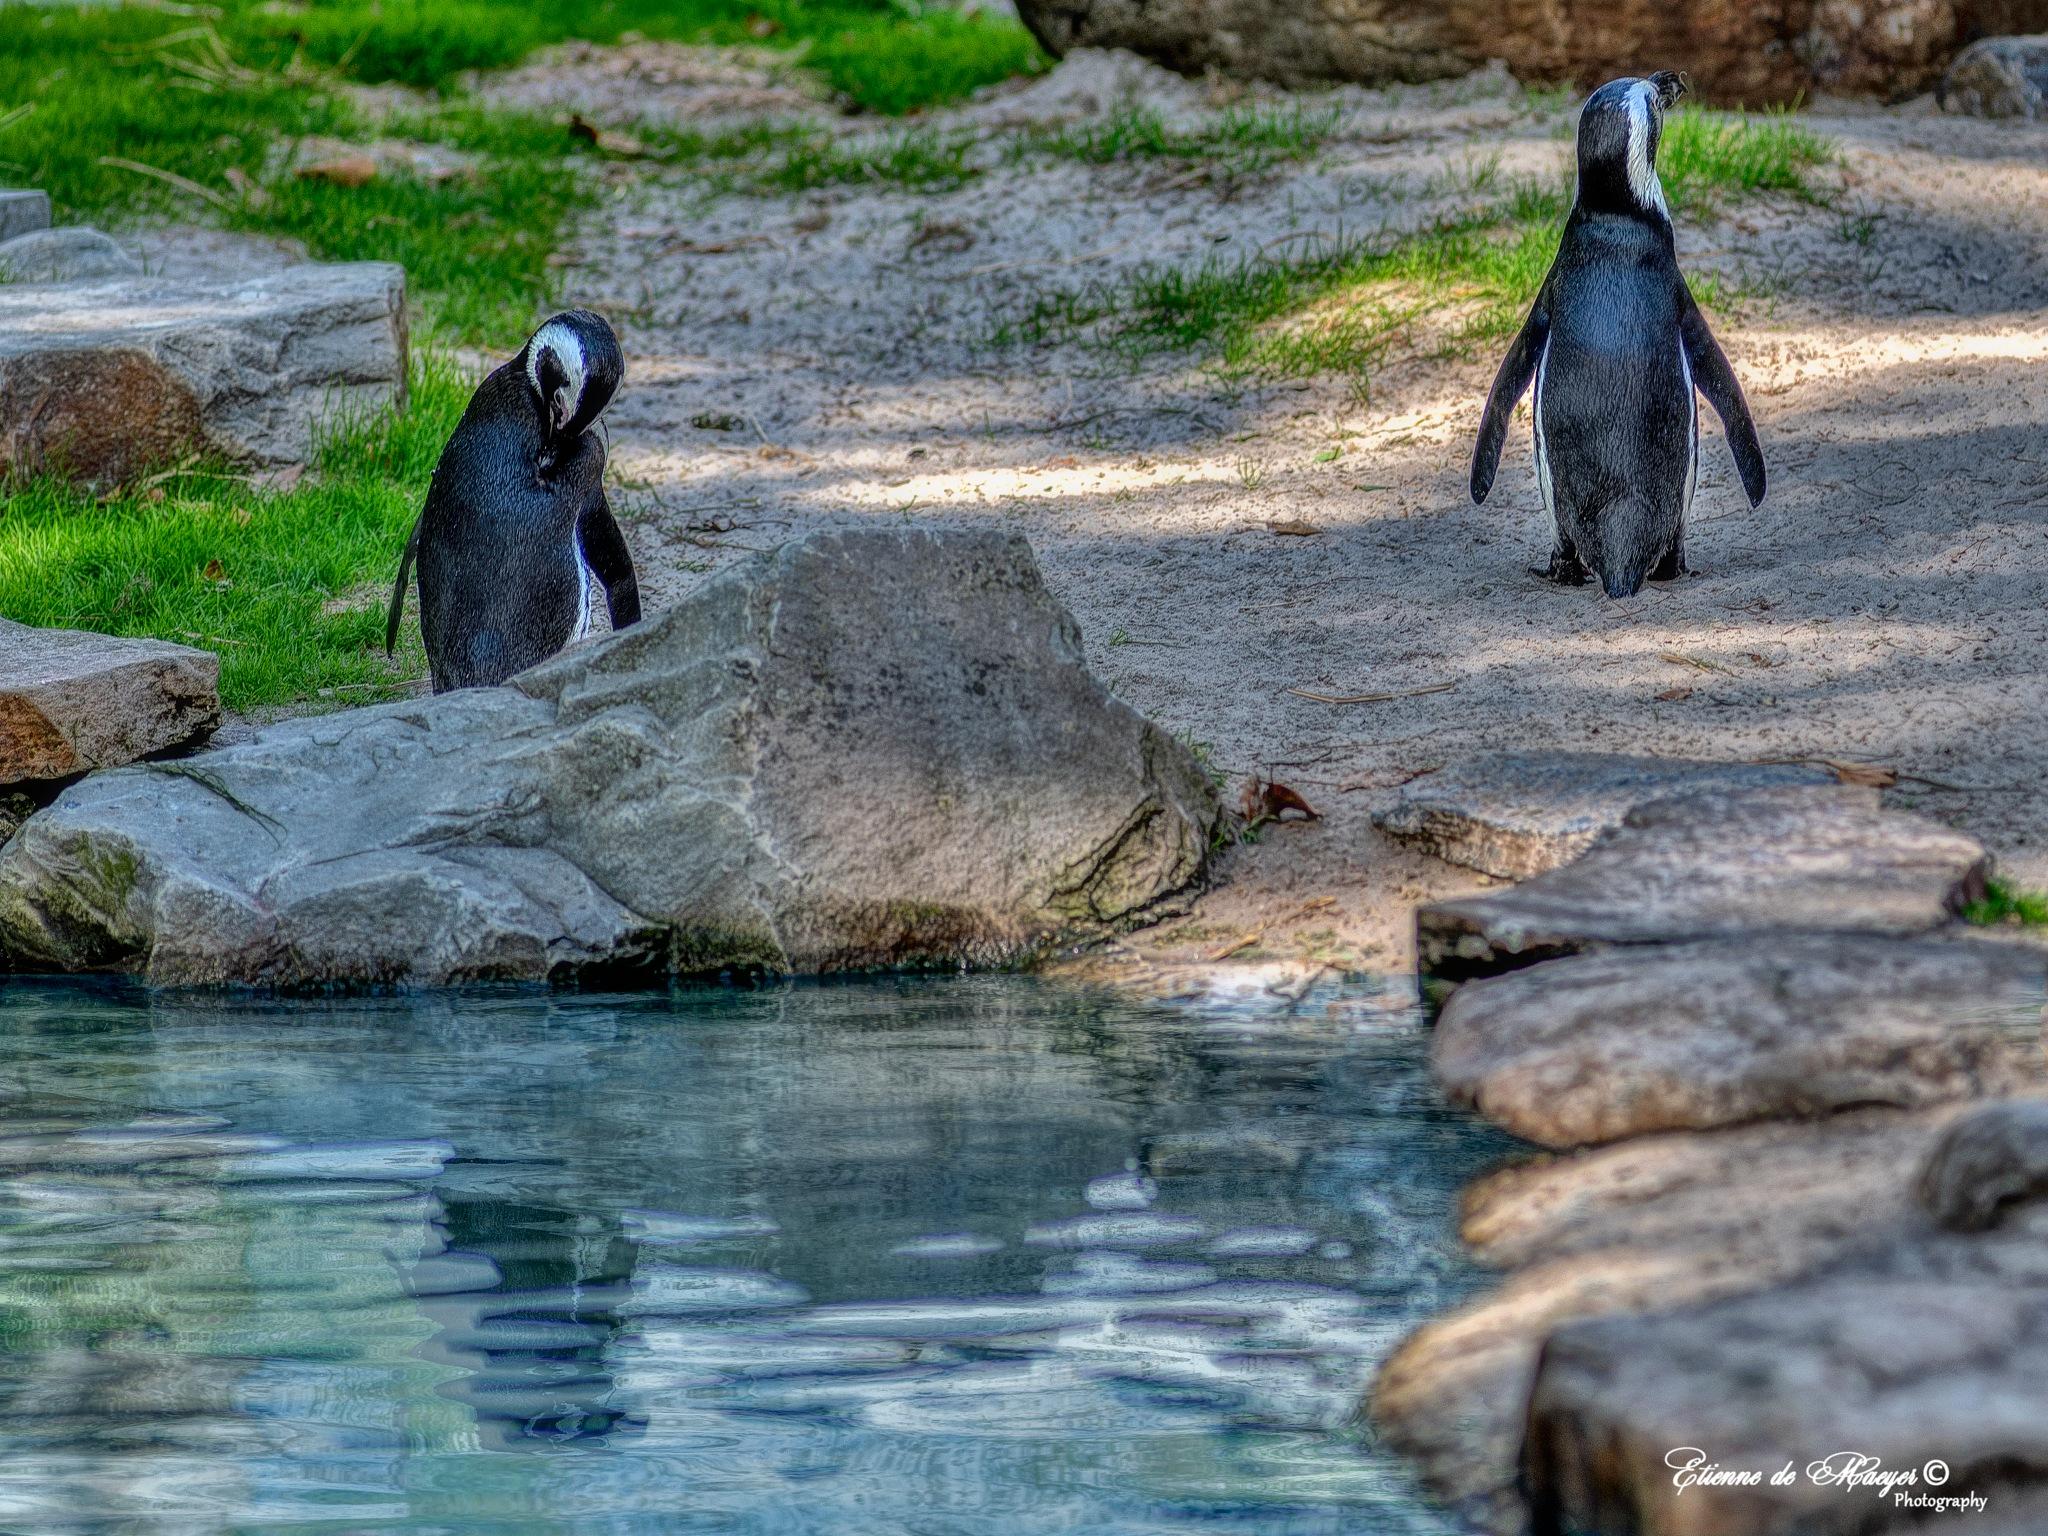 Pinguins by Etienne de Maeyer